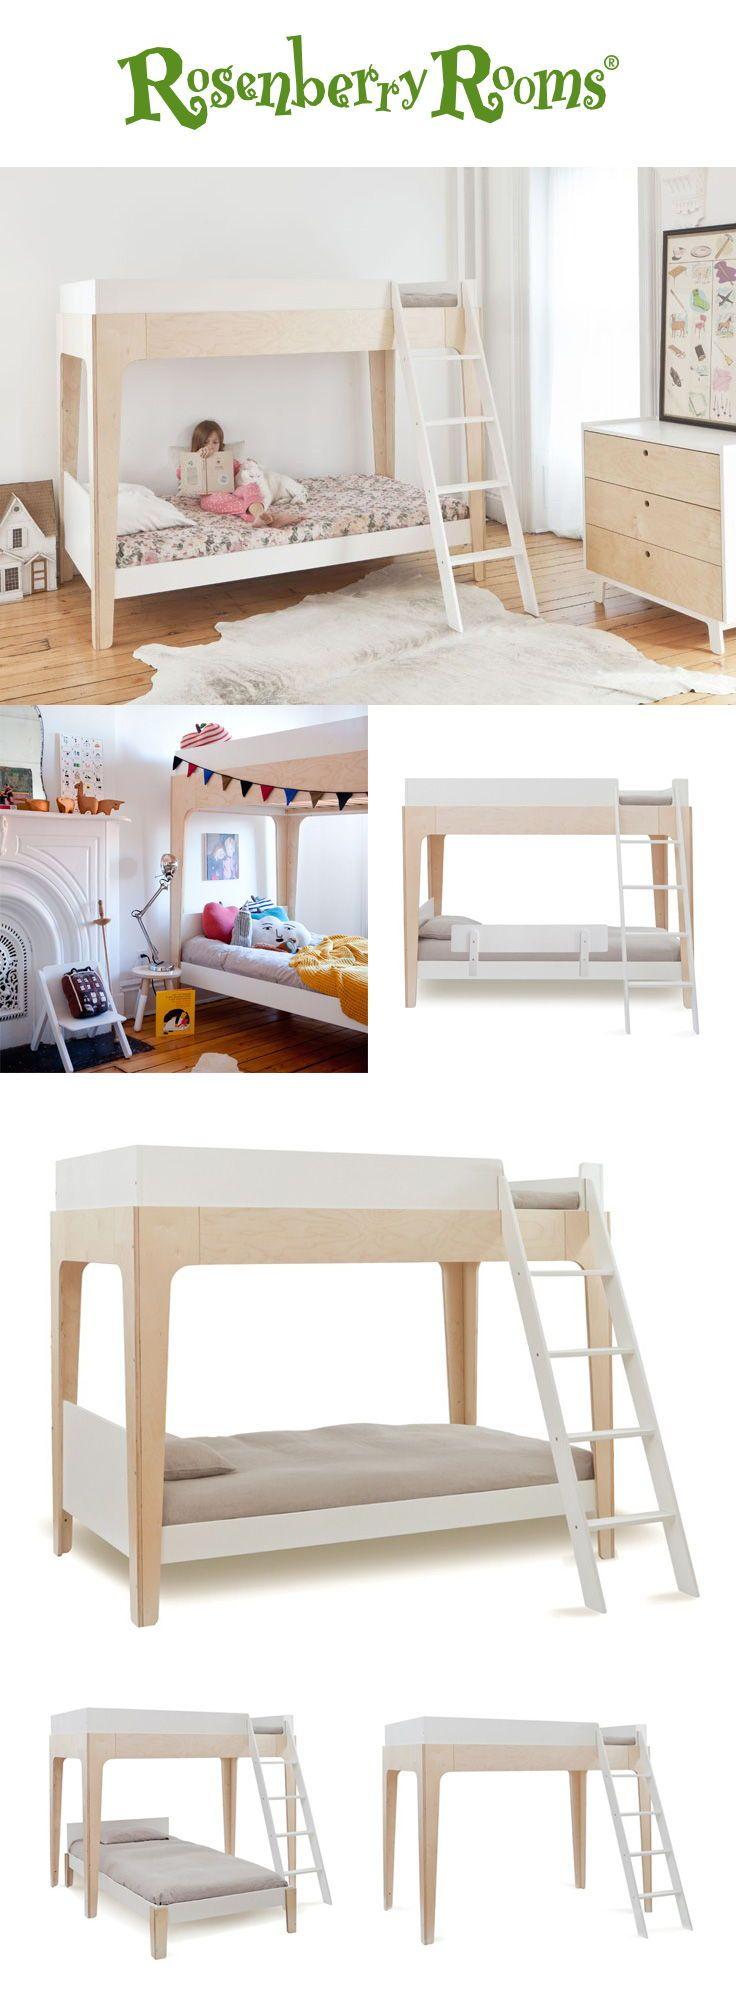 Love this modern loft! Available as a bunk, loft, or loft